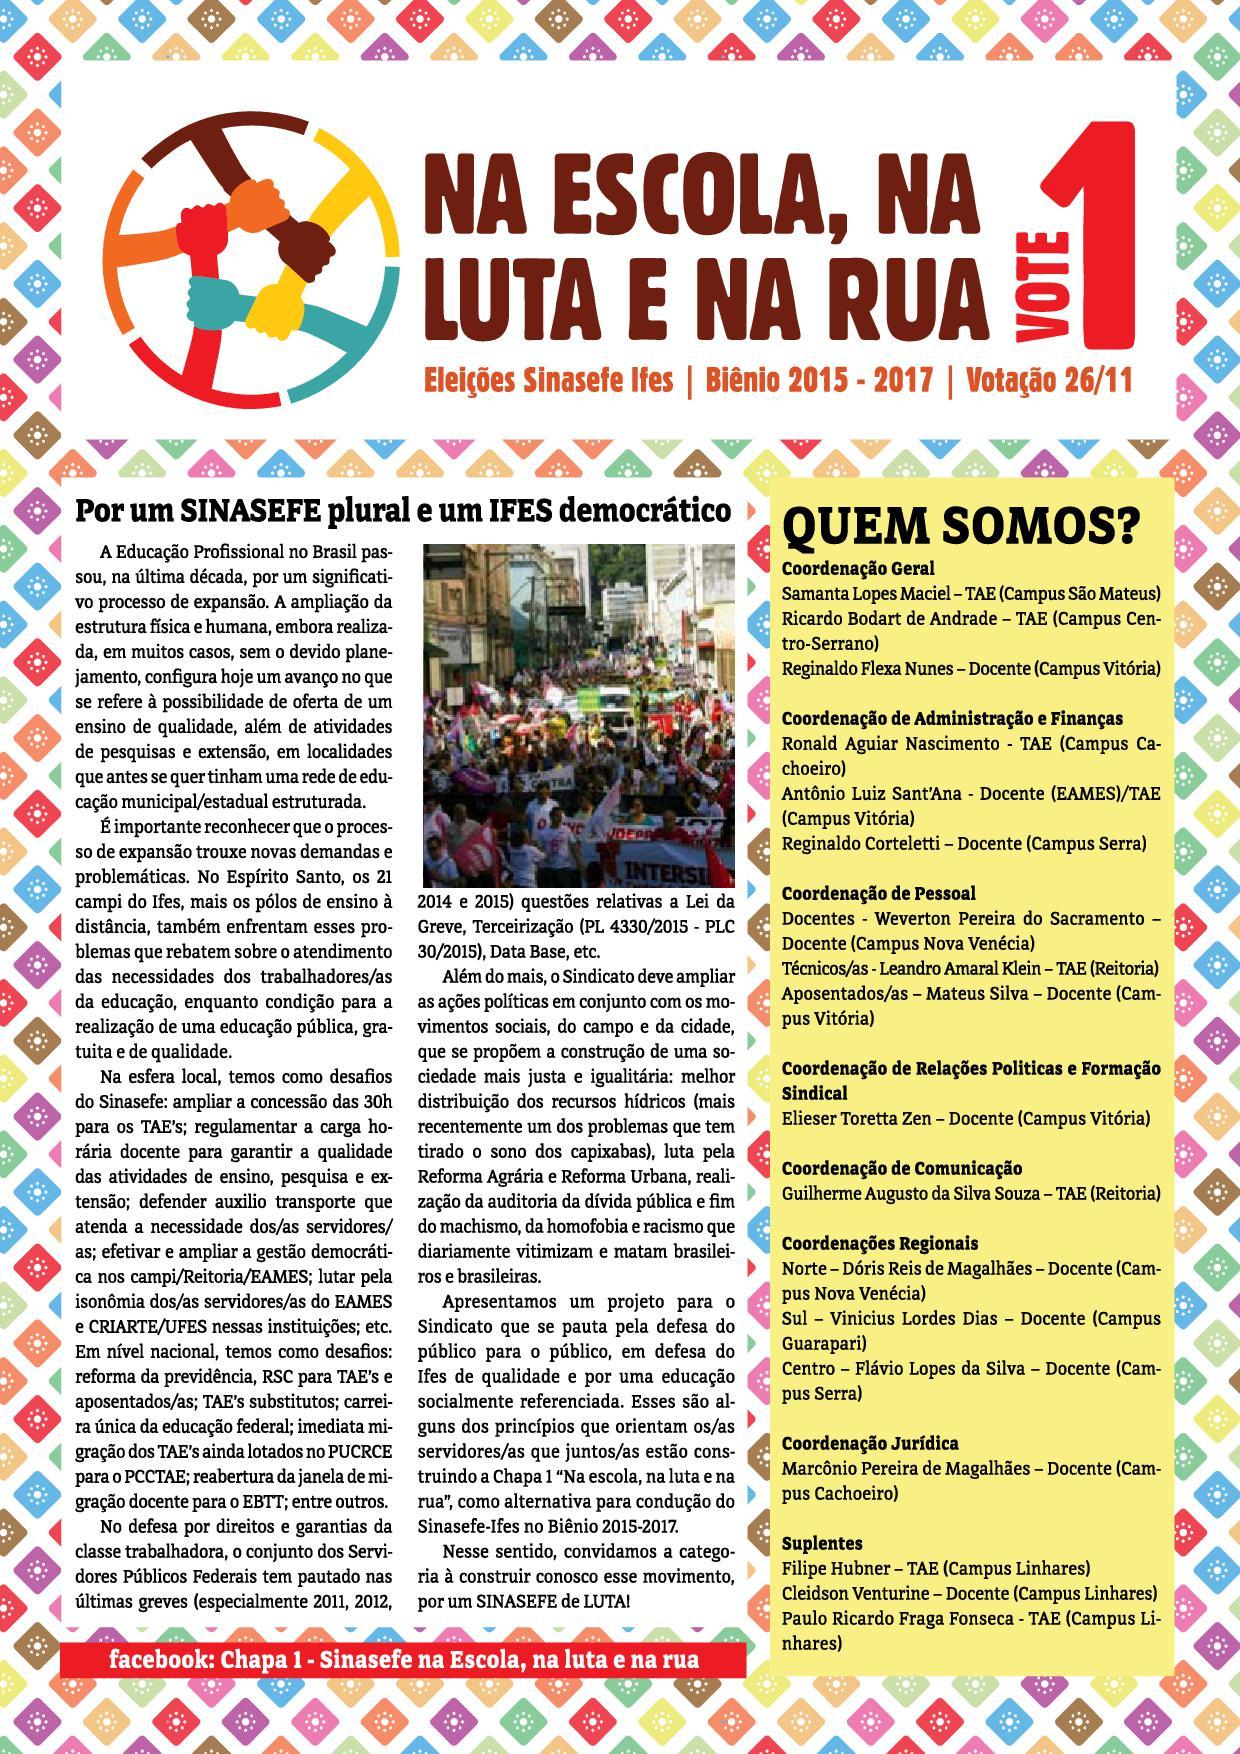 jornal_chapa1_sinasefe_WEB (1) (1)